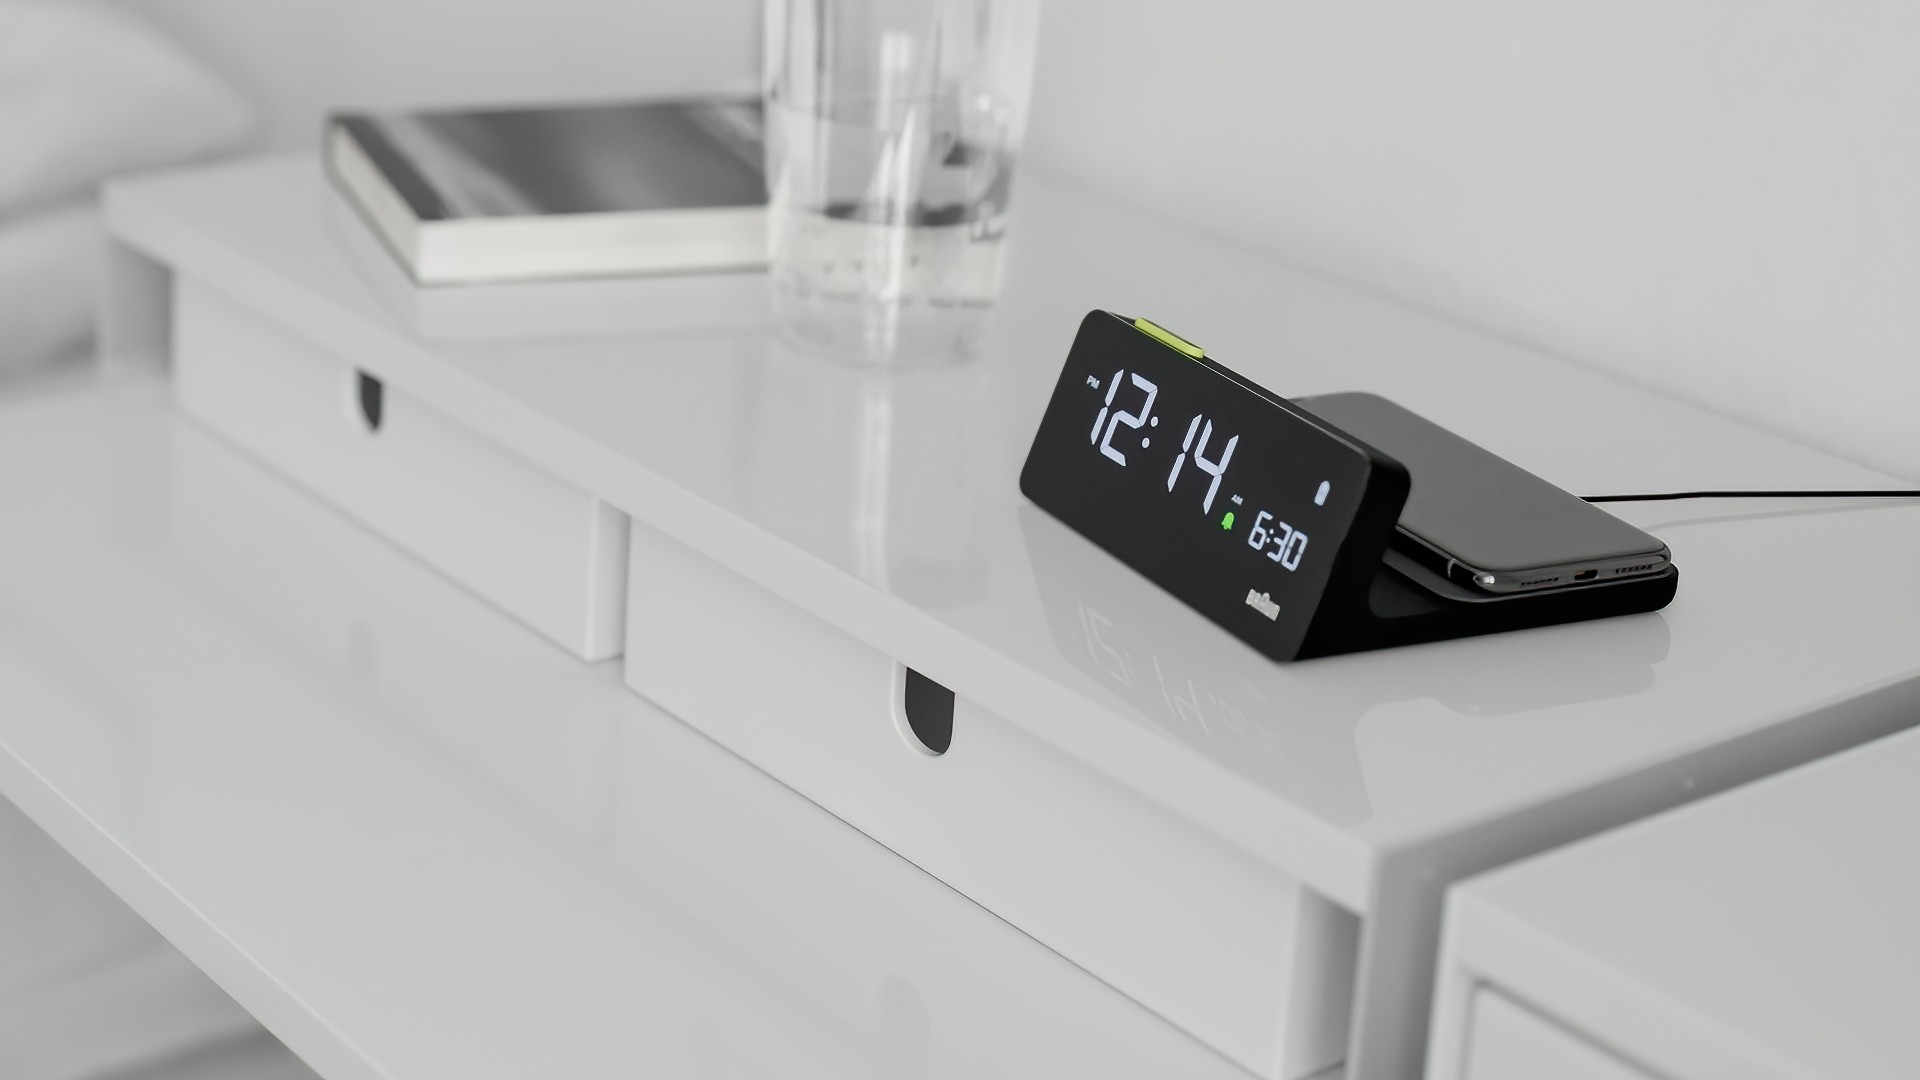 BC21 digital wireless charging clock by Braun